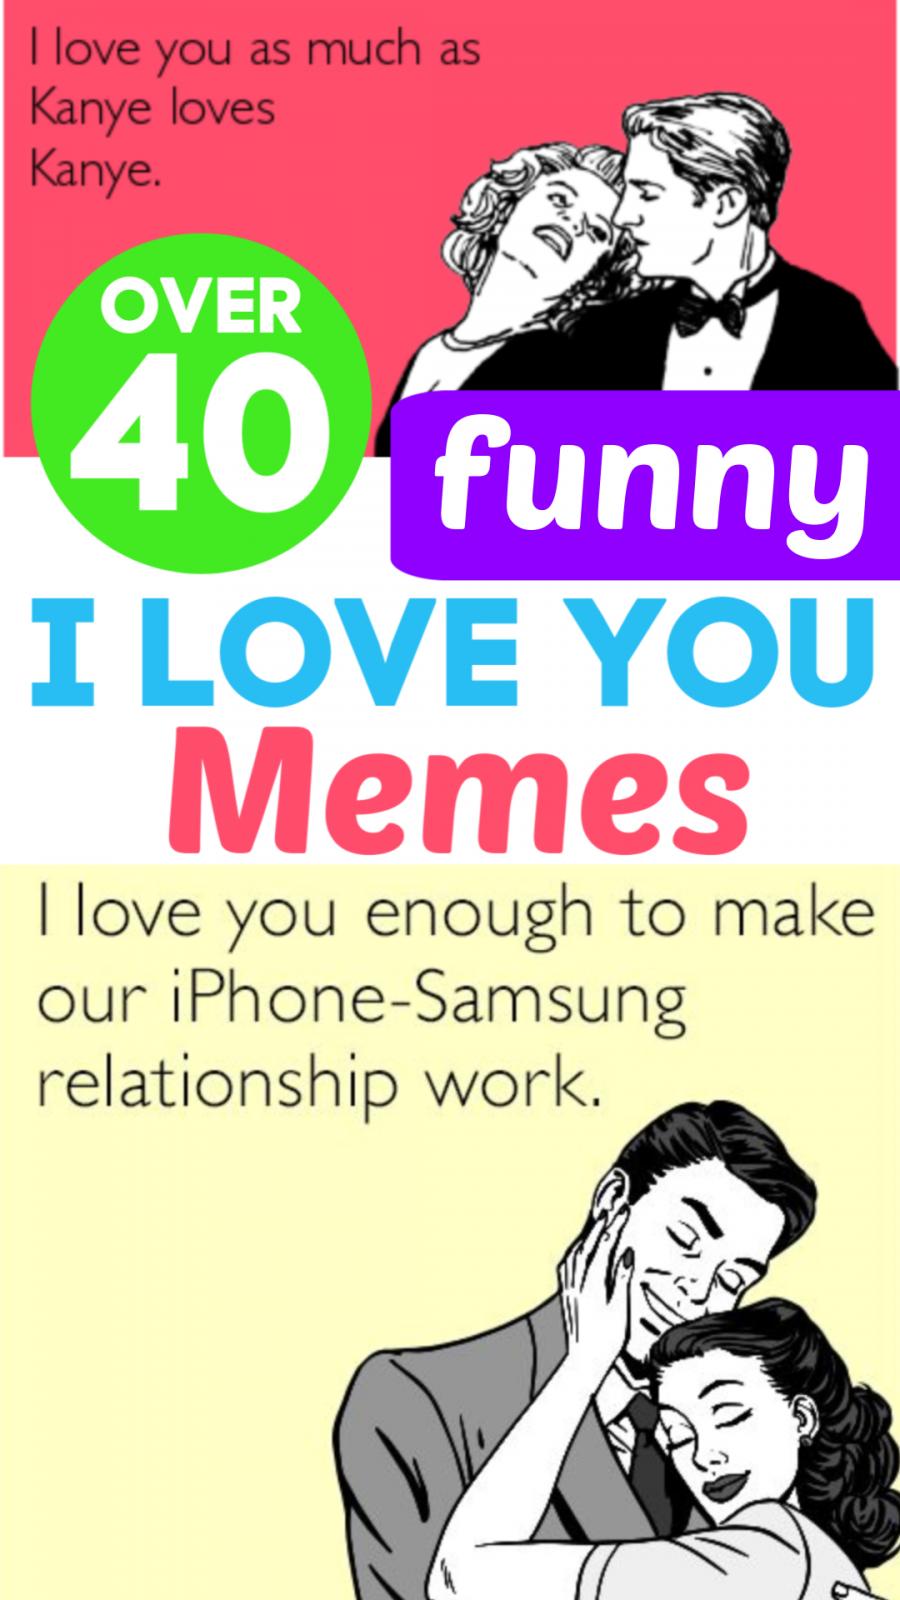 Over 40 Funny I Love You Memes Love You Meme Flirty Good Morning Quotes Flirty Memes